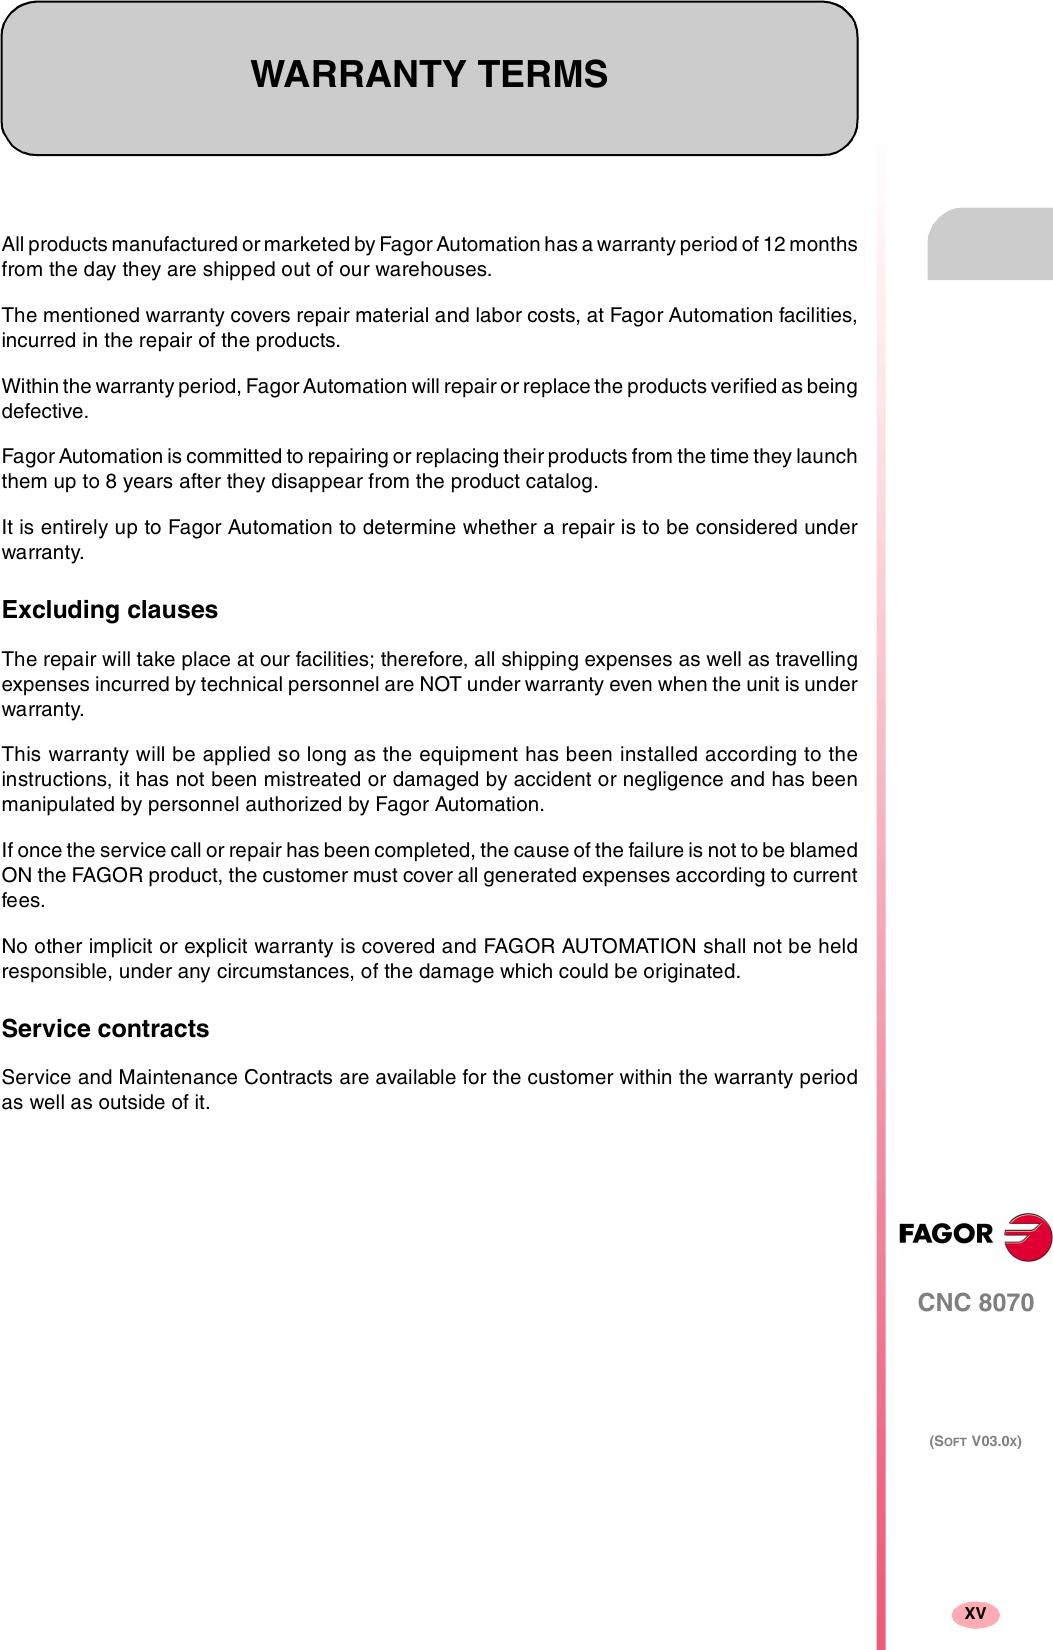 Fagor Cnc8070 Users Manual CNC 8070 Operating